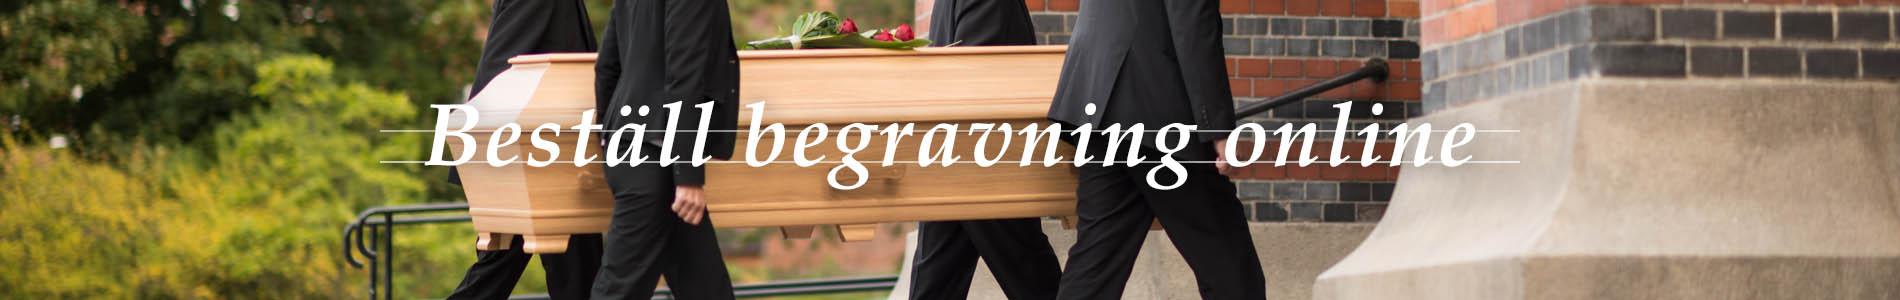 Axelssons-Begravningsbyrå-Min-Sida-banner_online